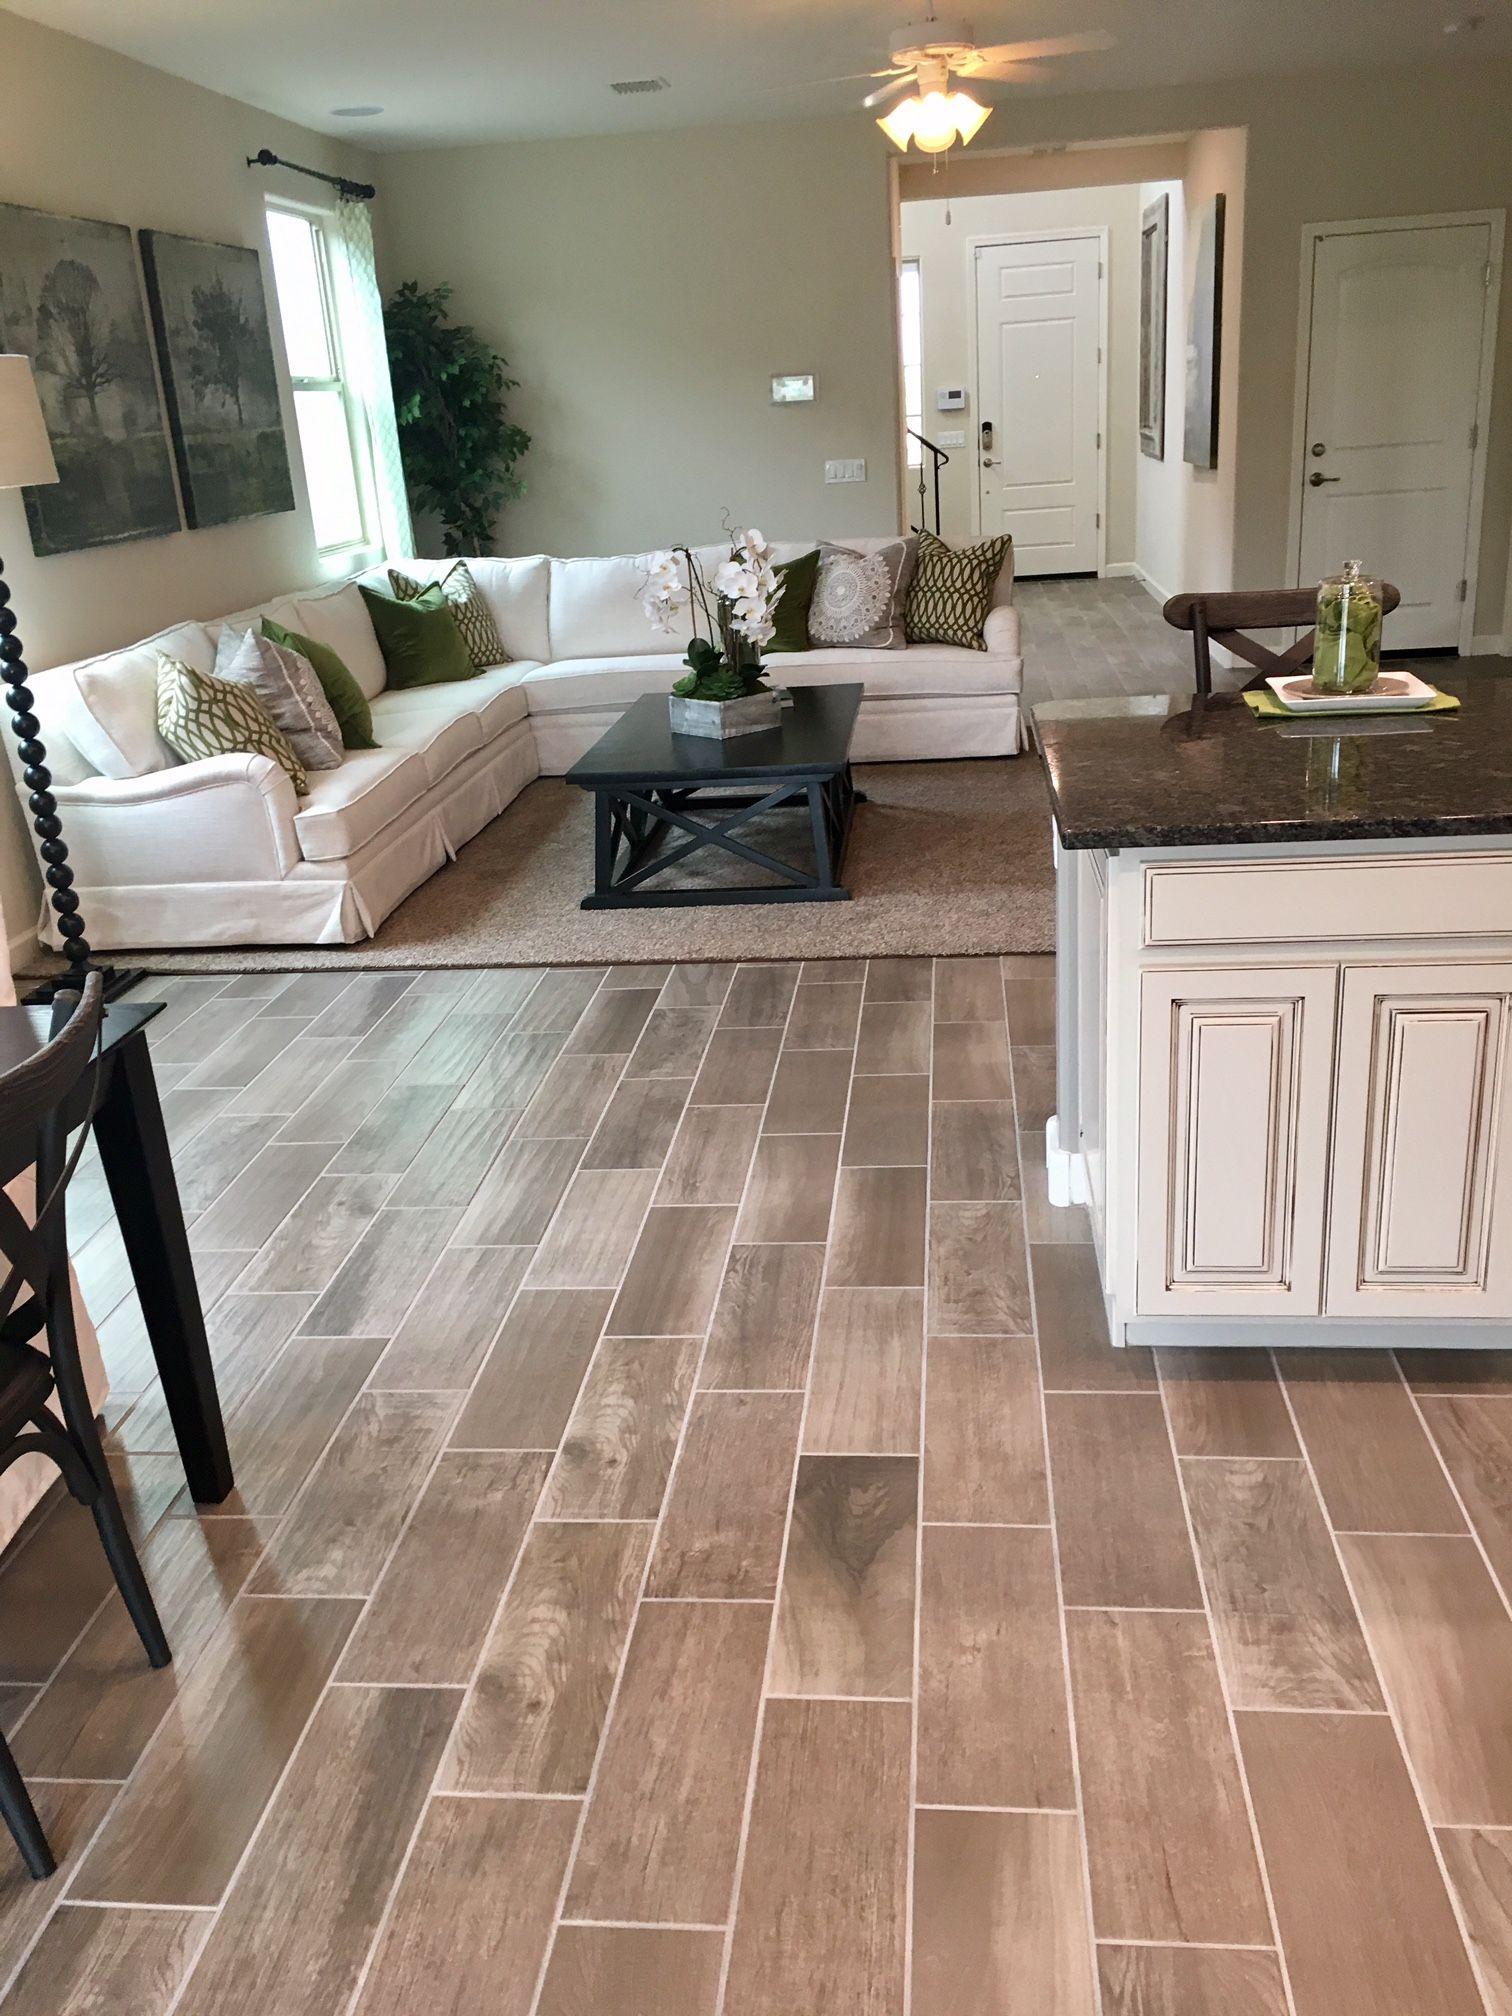 Grey tile flooring Tile floor, Grey tiles